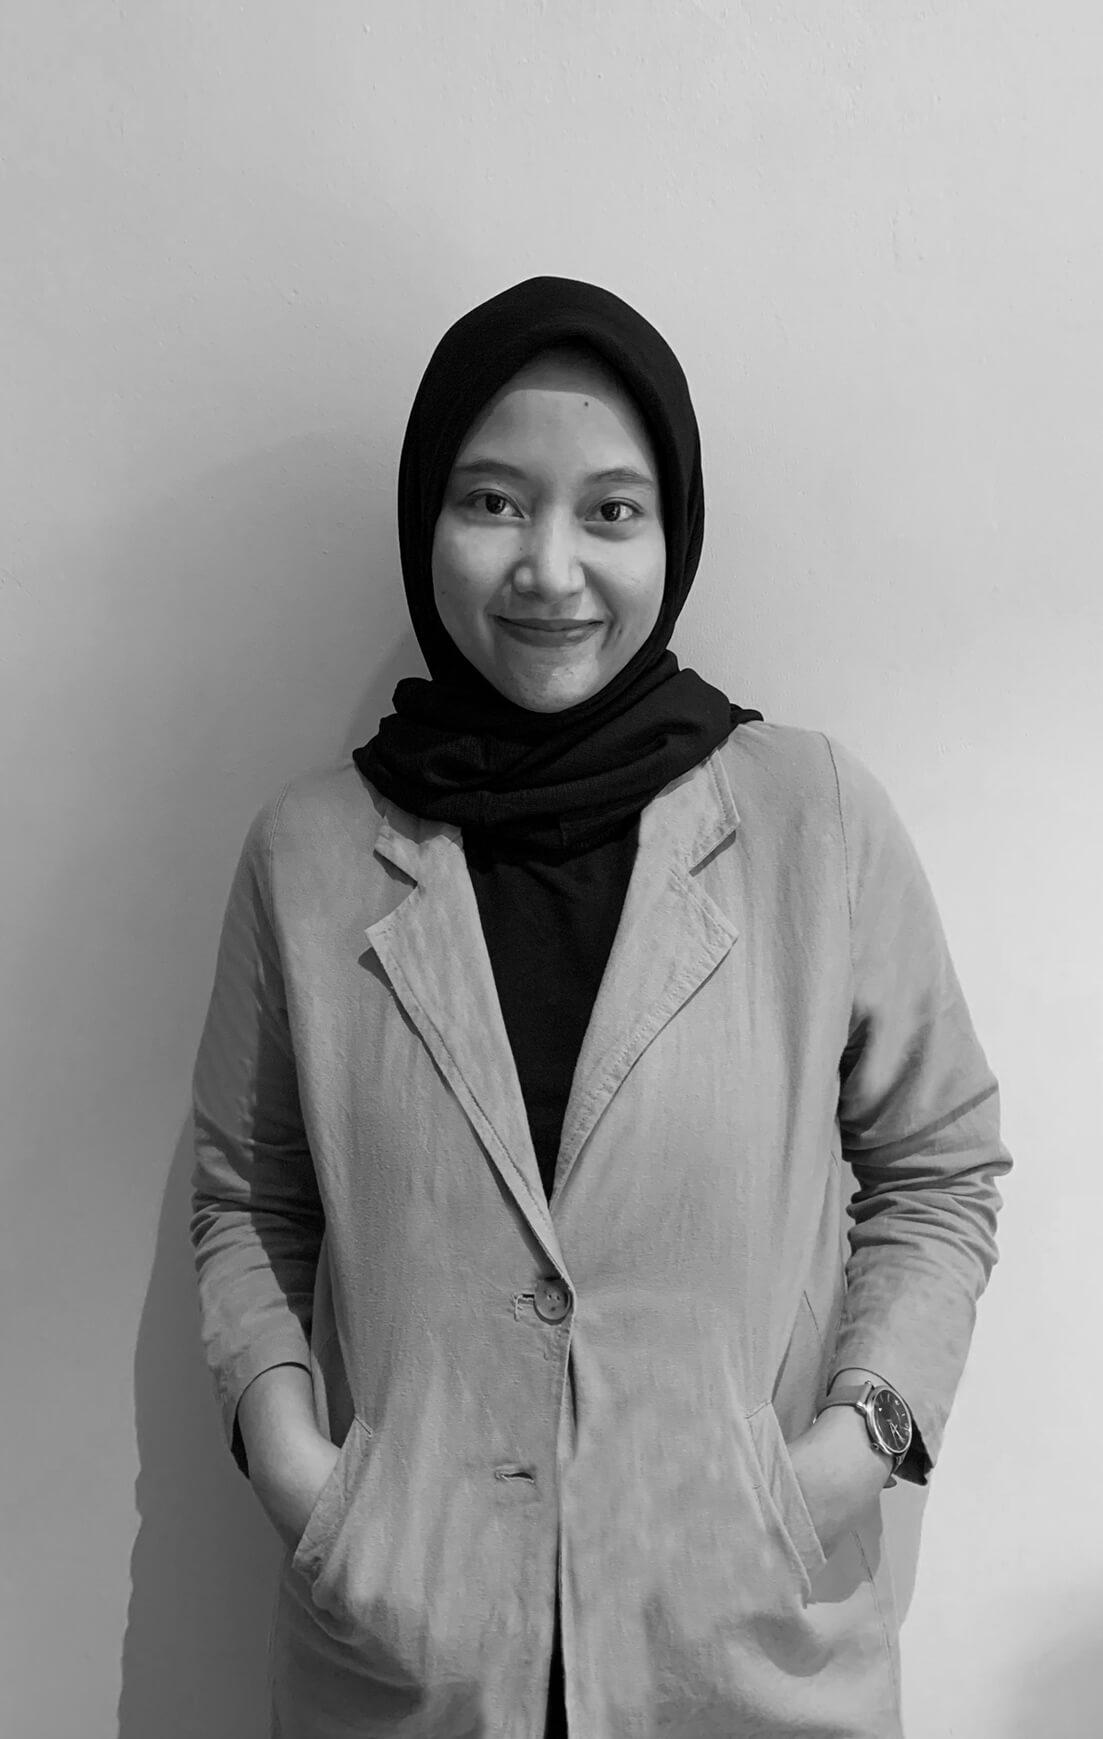 05 Annisa Manda Laksmitajayanti - Project Manager